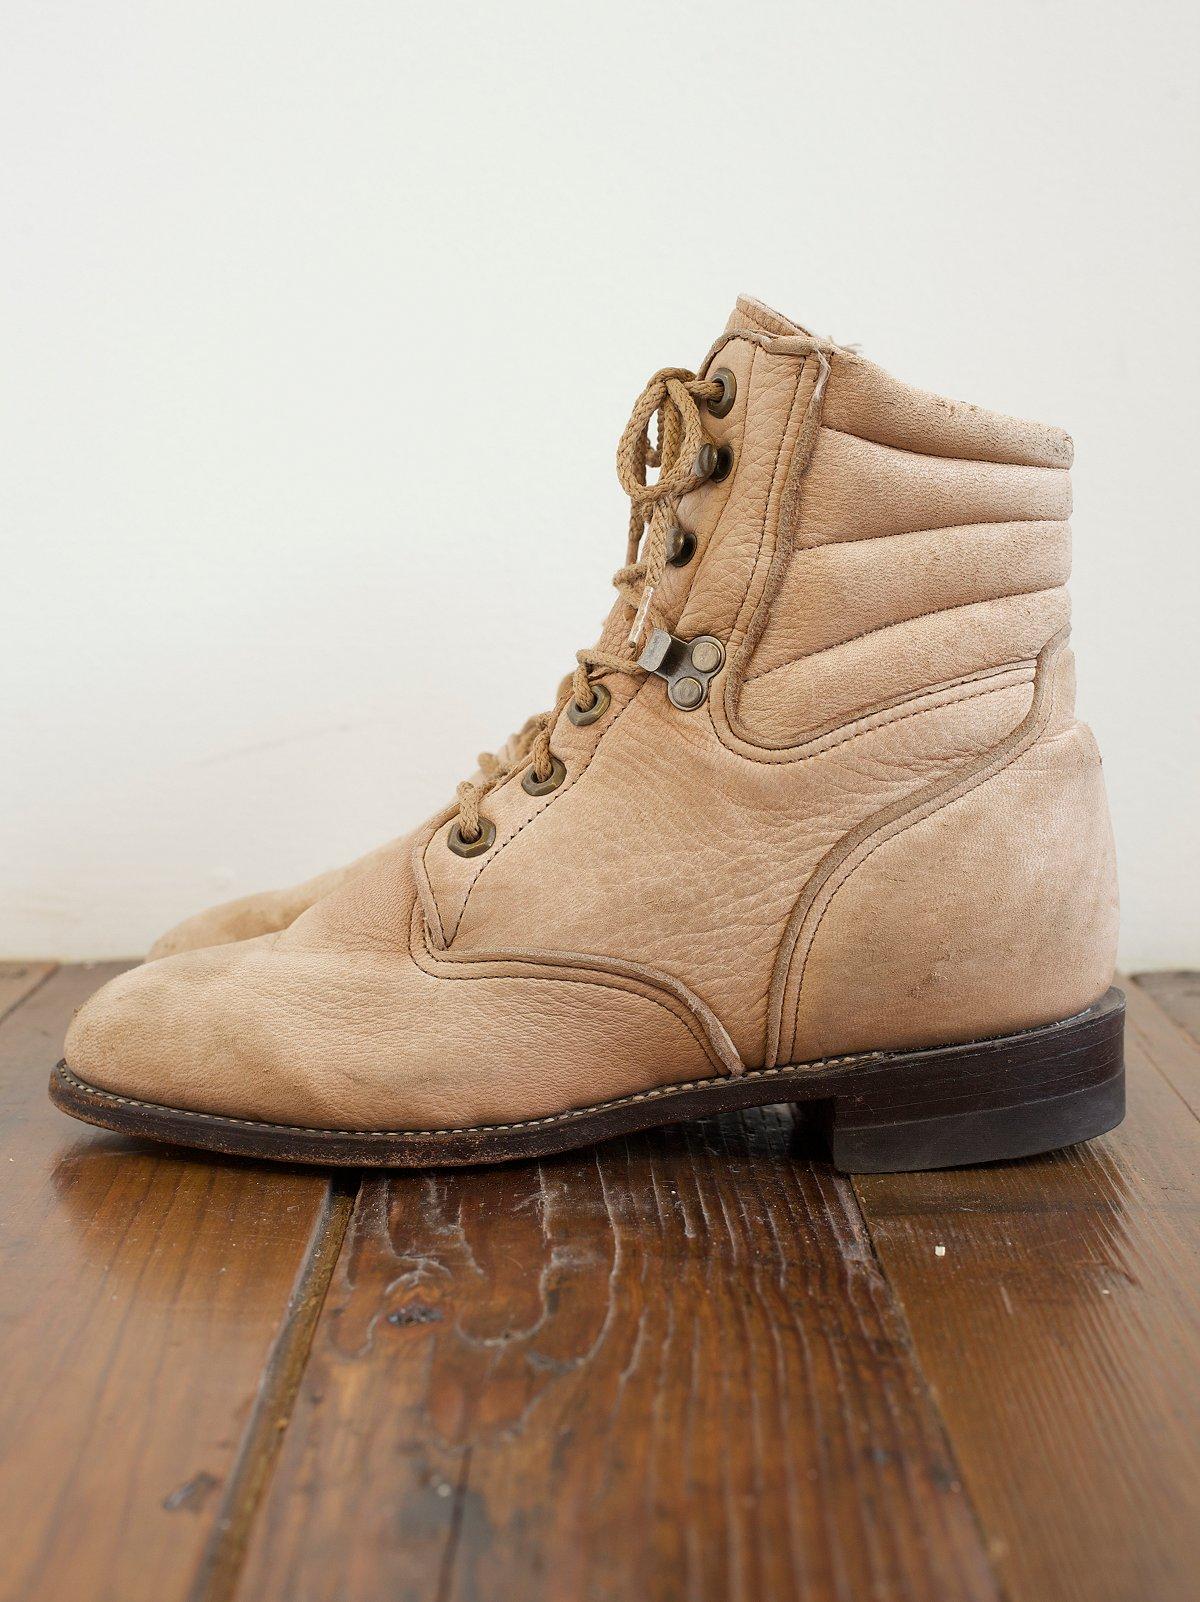 Vintage Hiking Boot